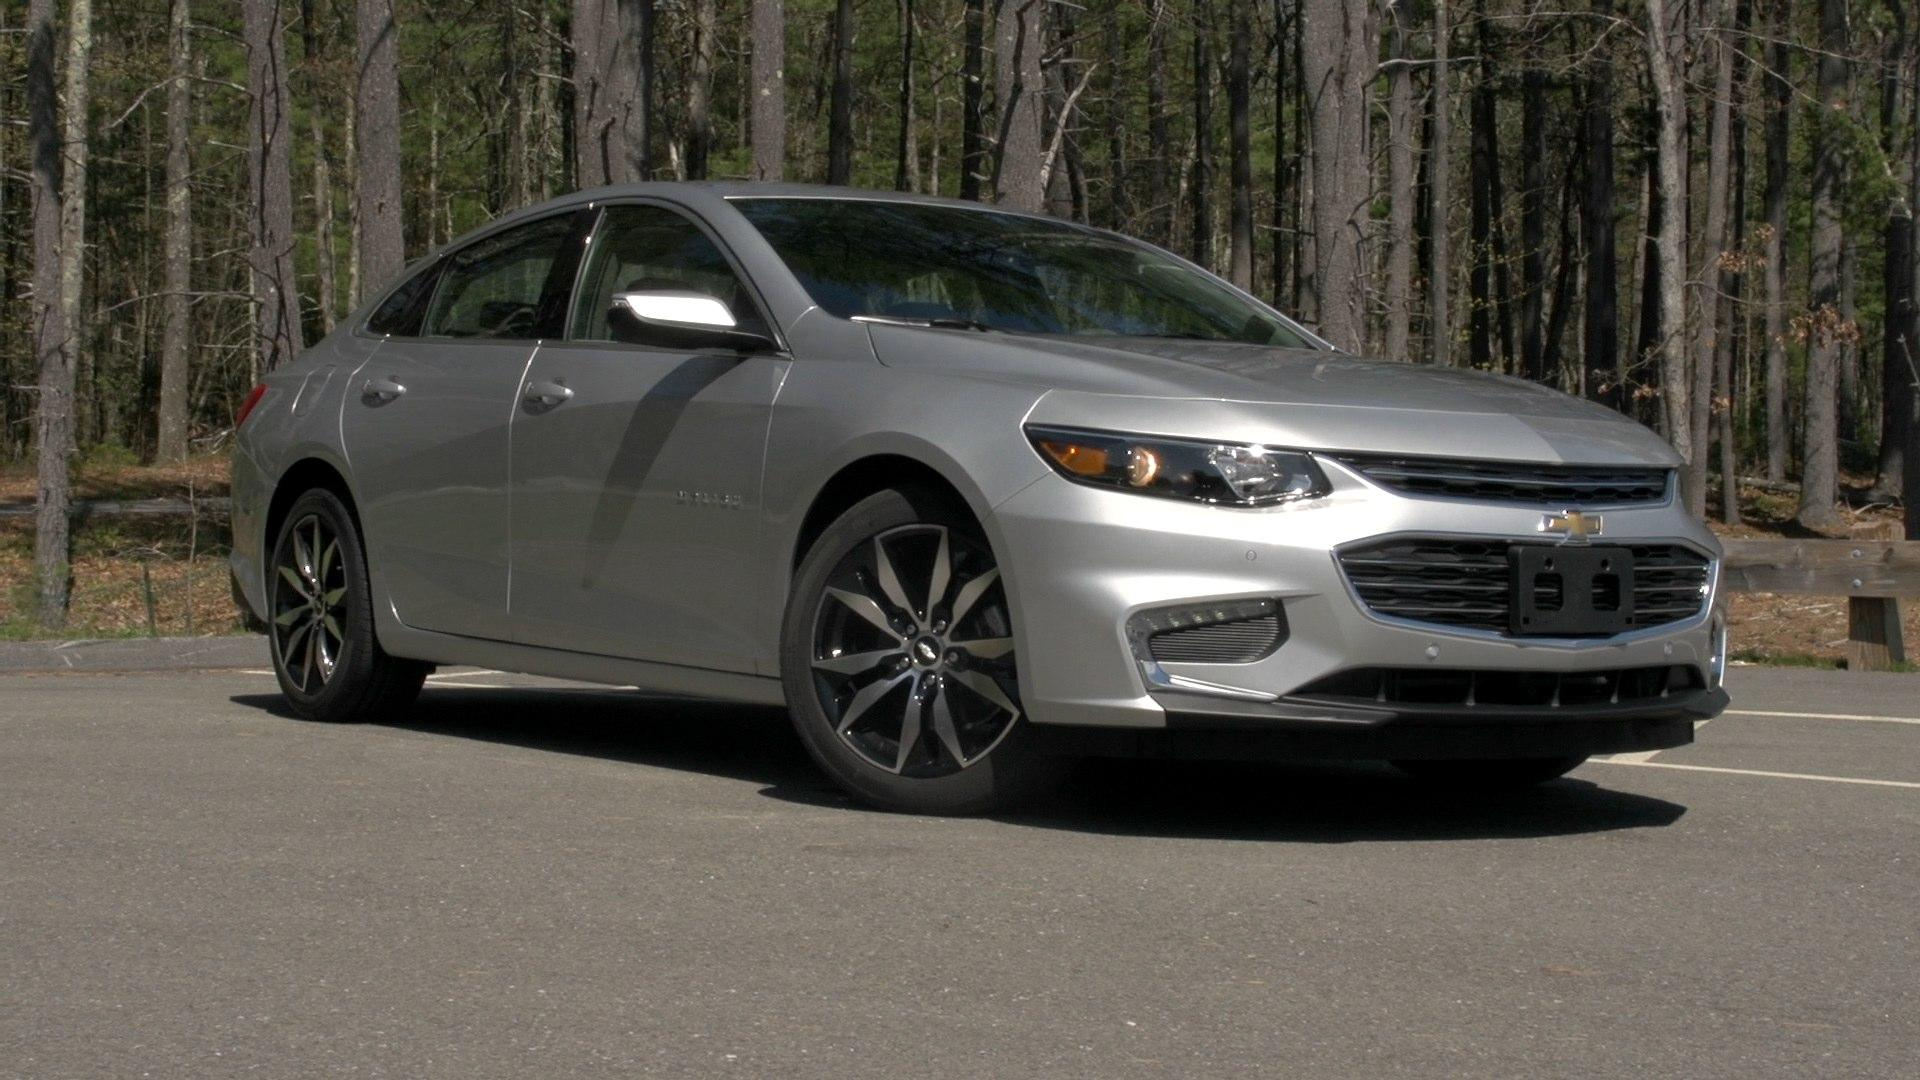 2018 Chevrolet Malibu Videos